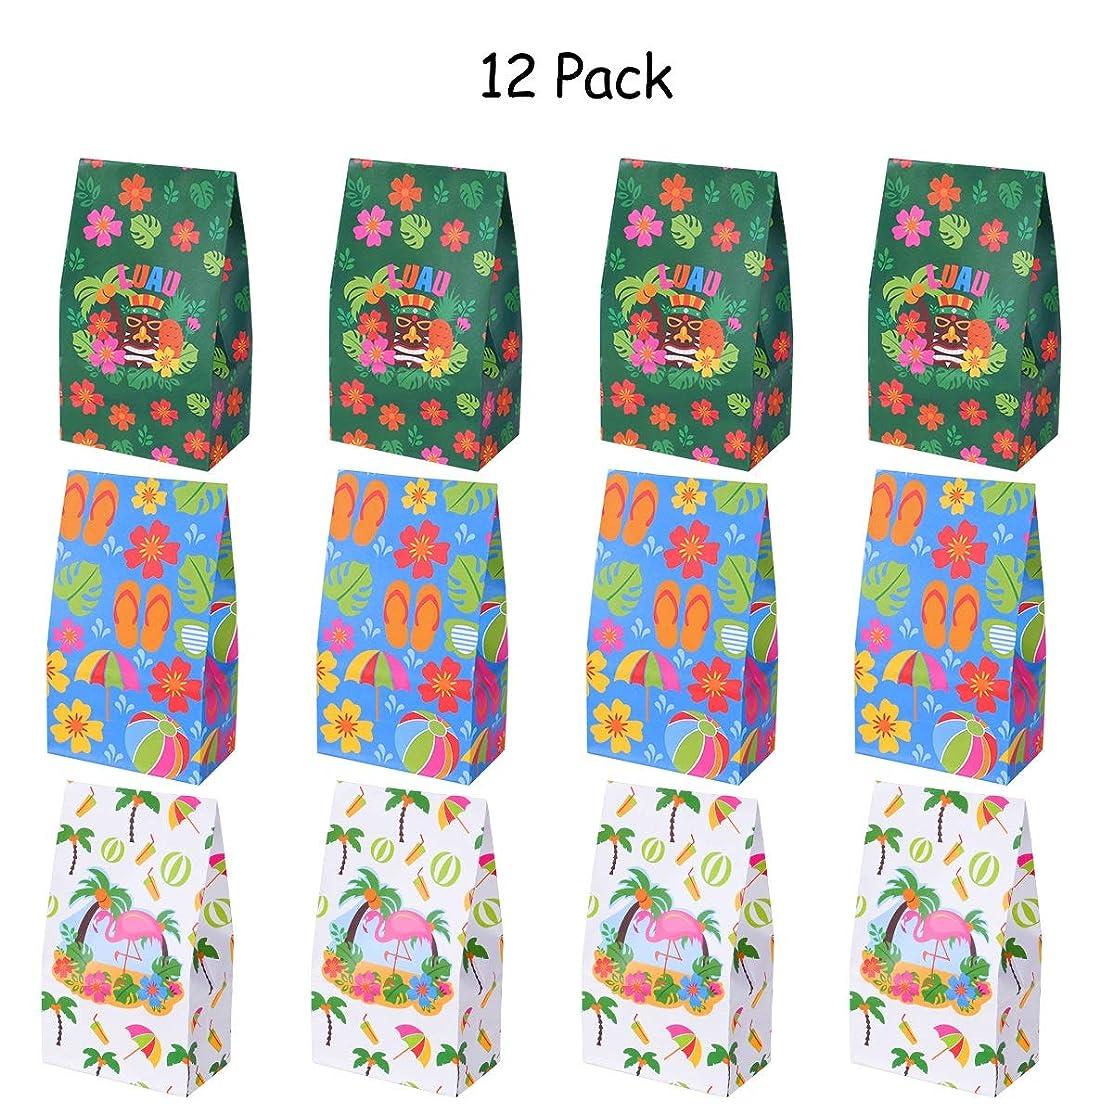 LUOEM Luau Hawaiian Treat Bags Hibiscus Gift Bags Treat Bags Candy Bags Paper Treat Sacks for Birthday Wedding Party Supplies 12PCS